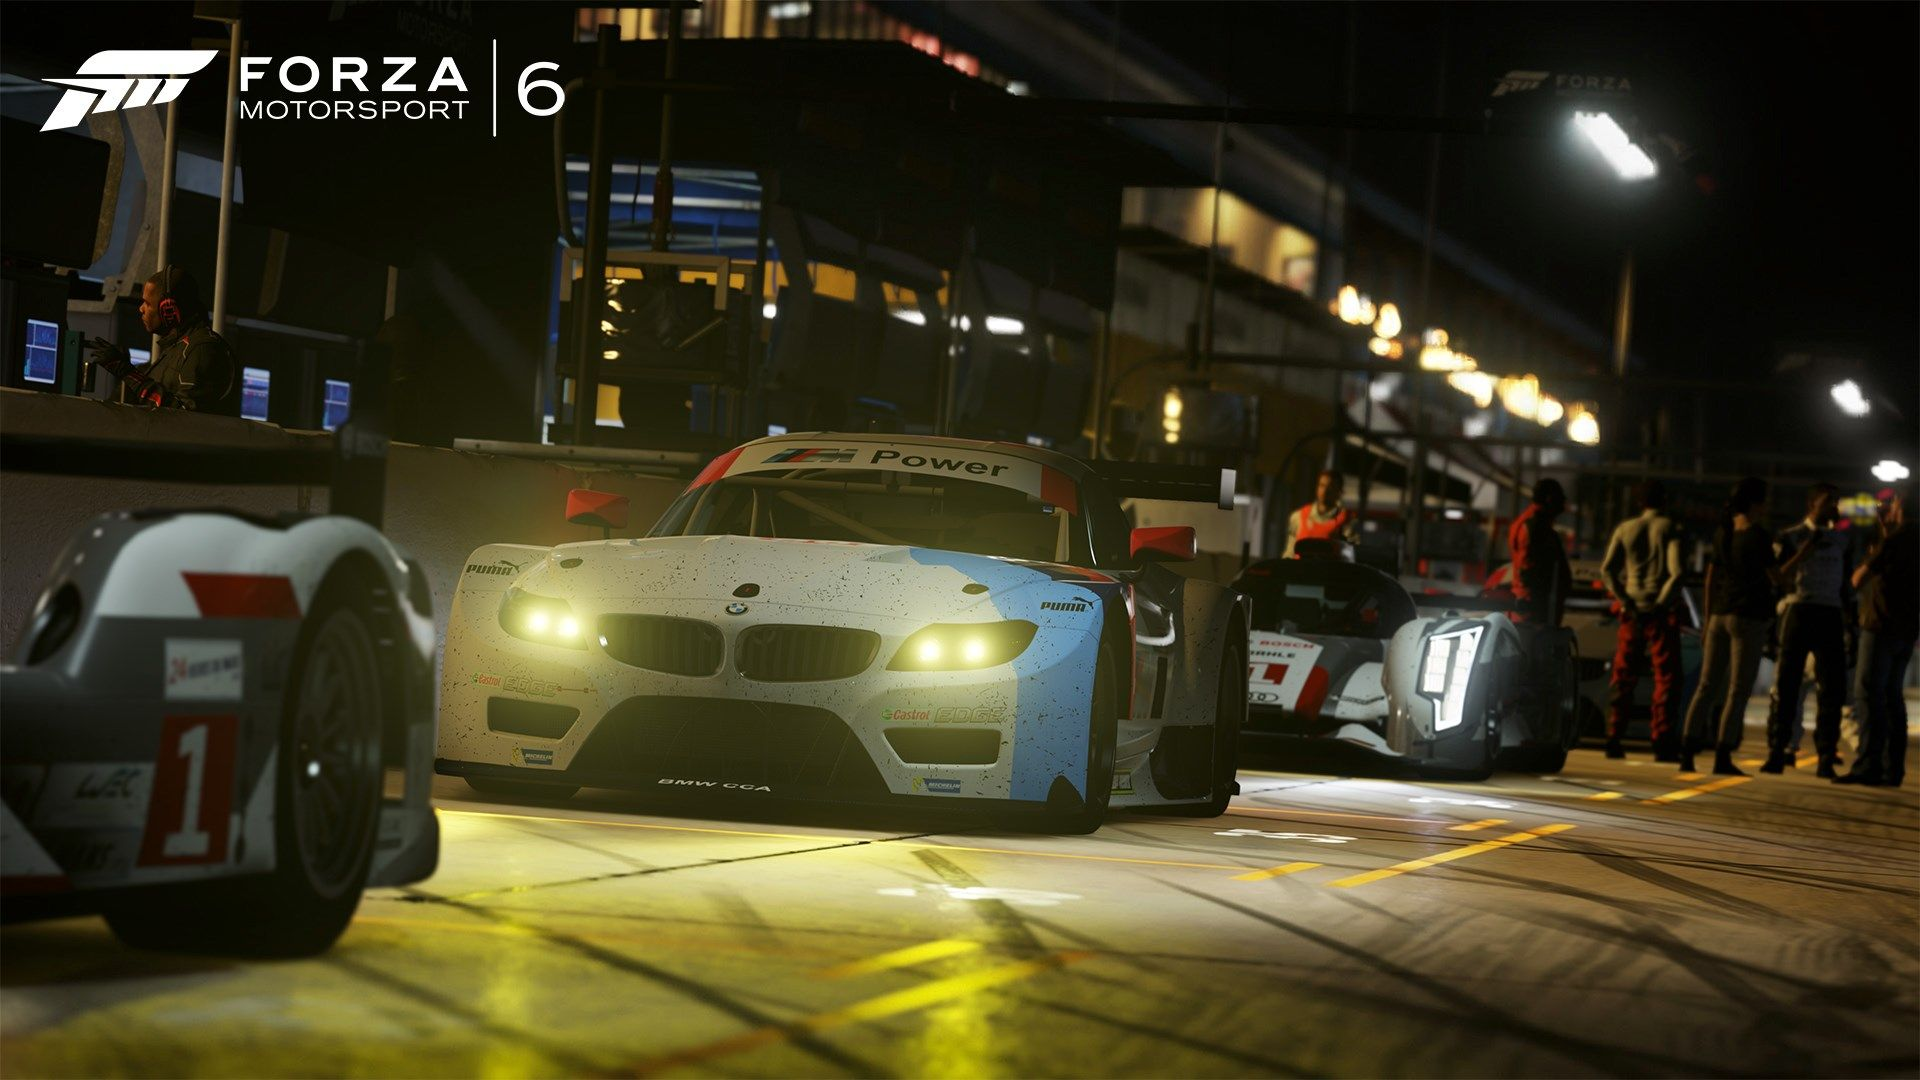 Forza Motorsport 6 Wallpaper Free